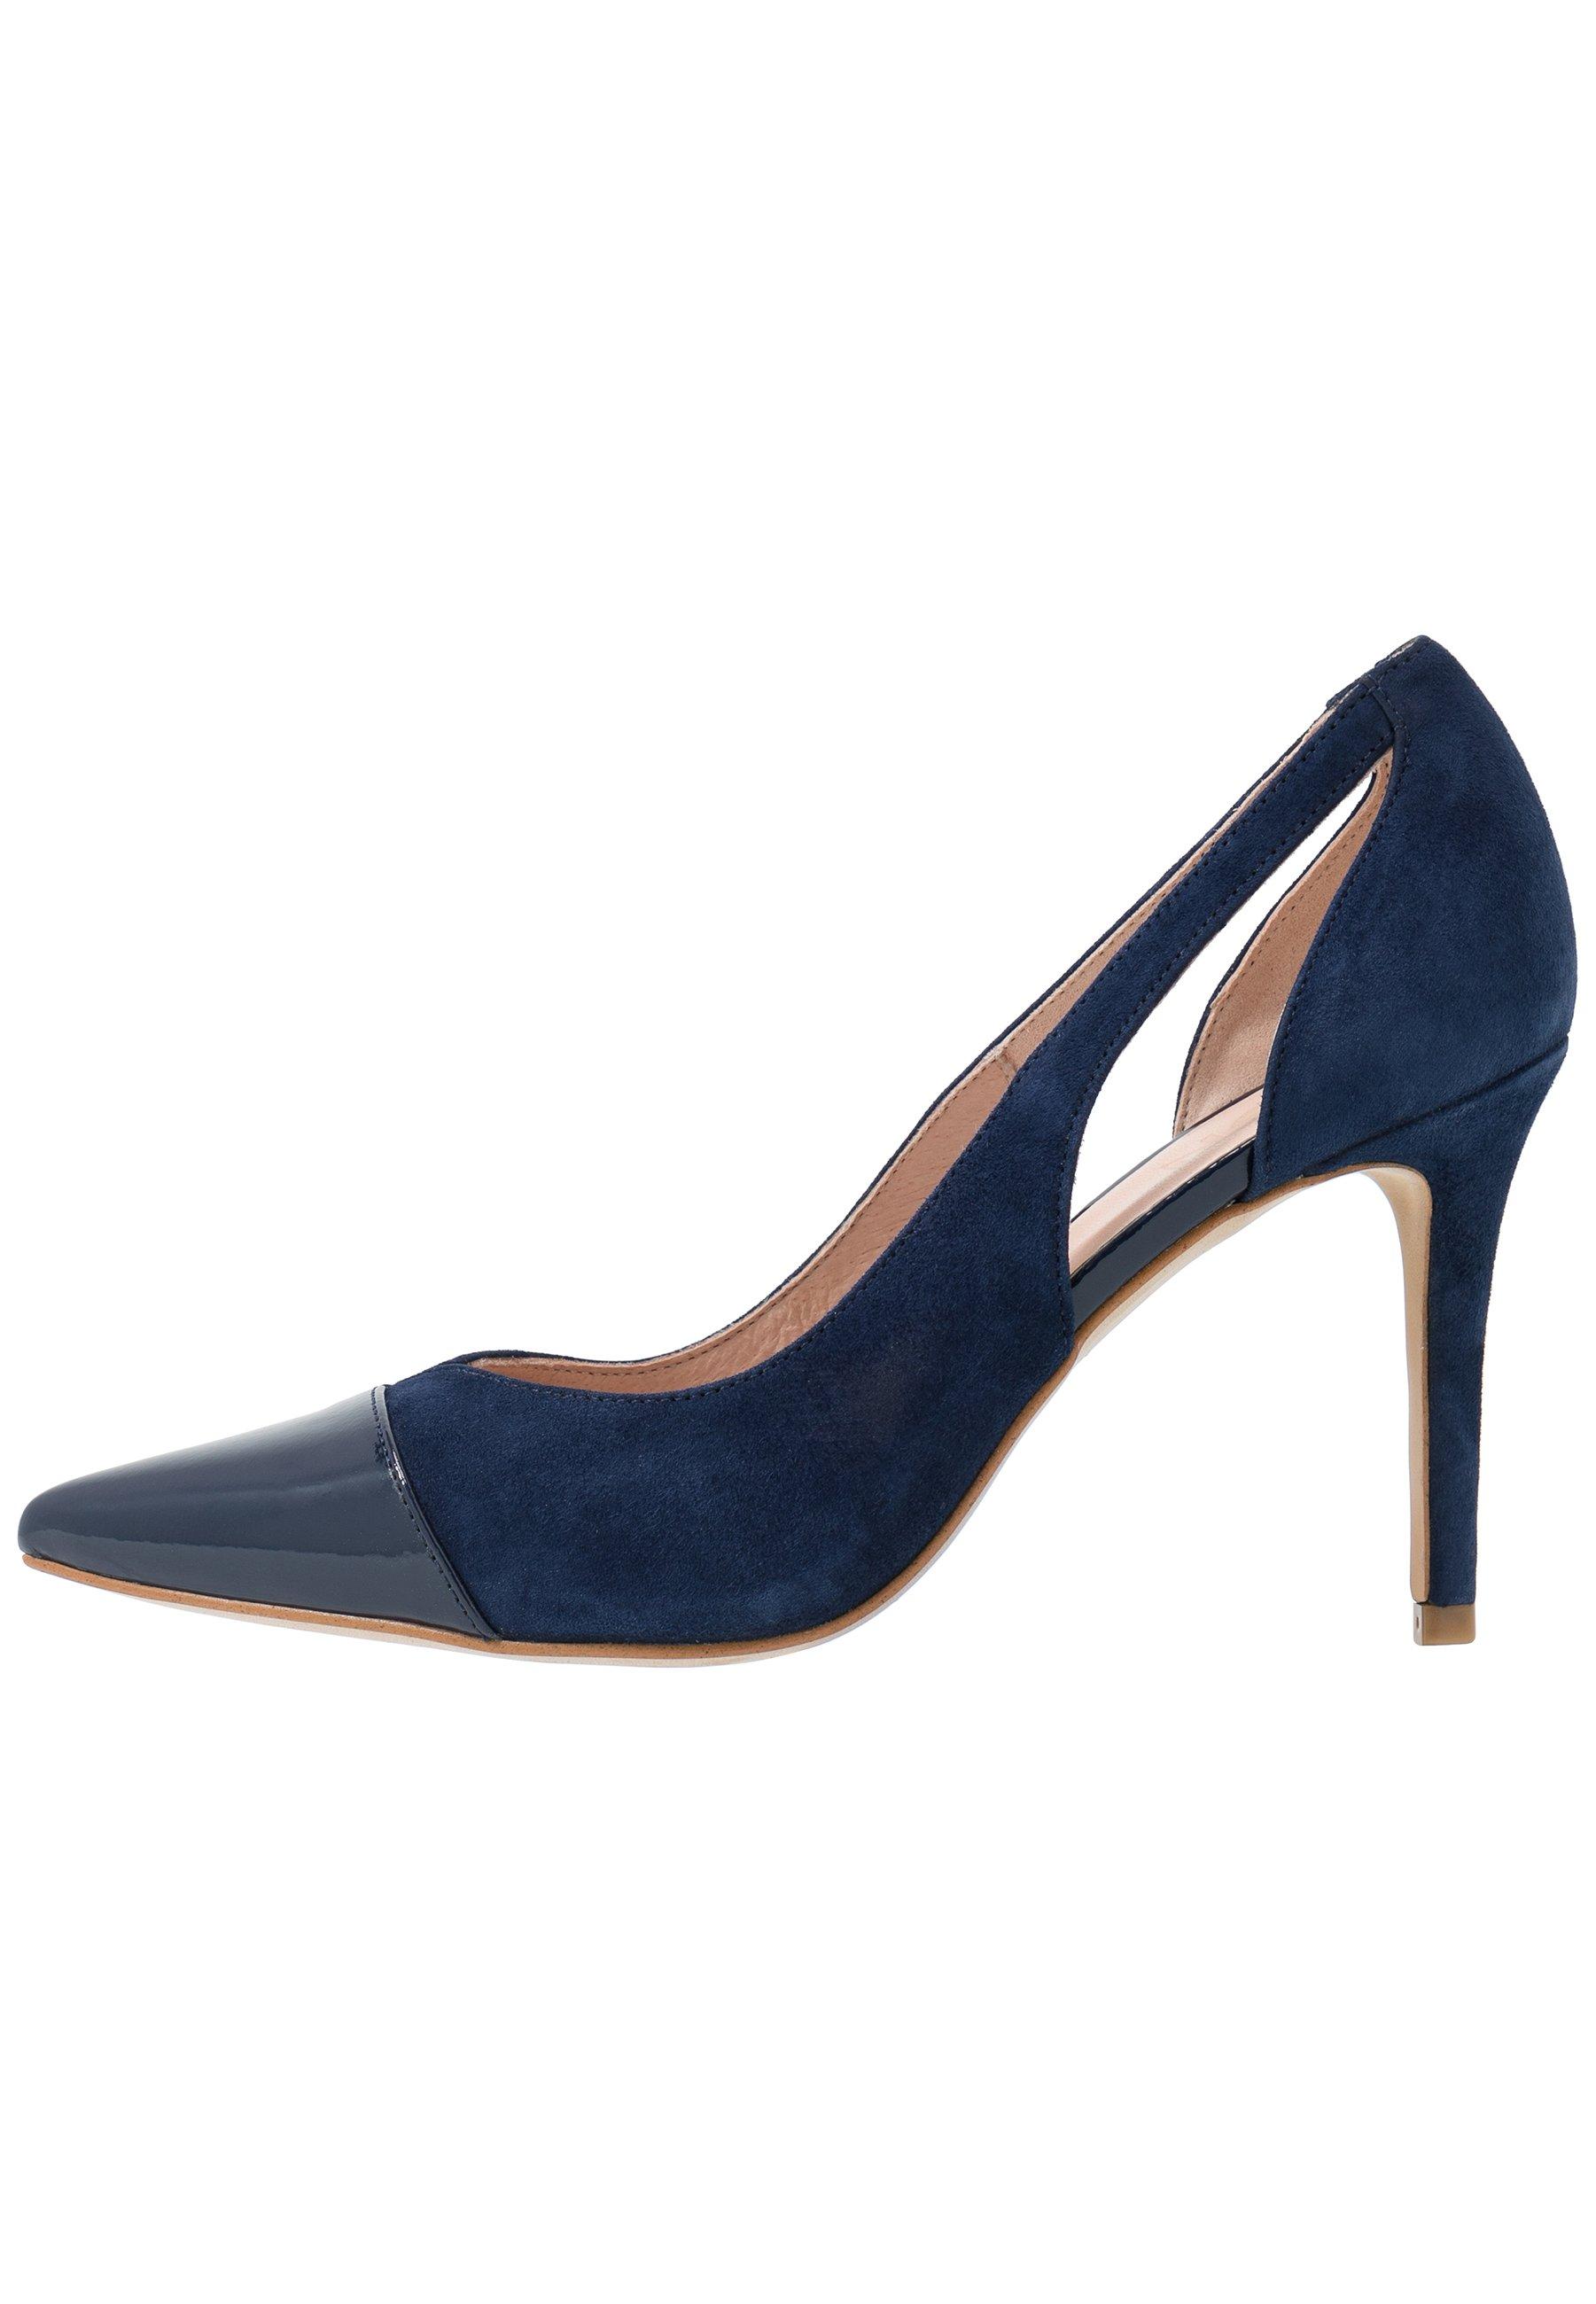 High Heel Pumps royal blue